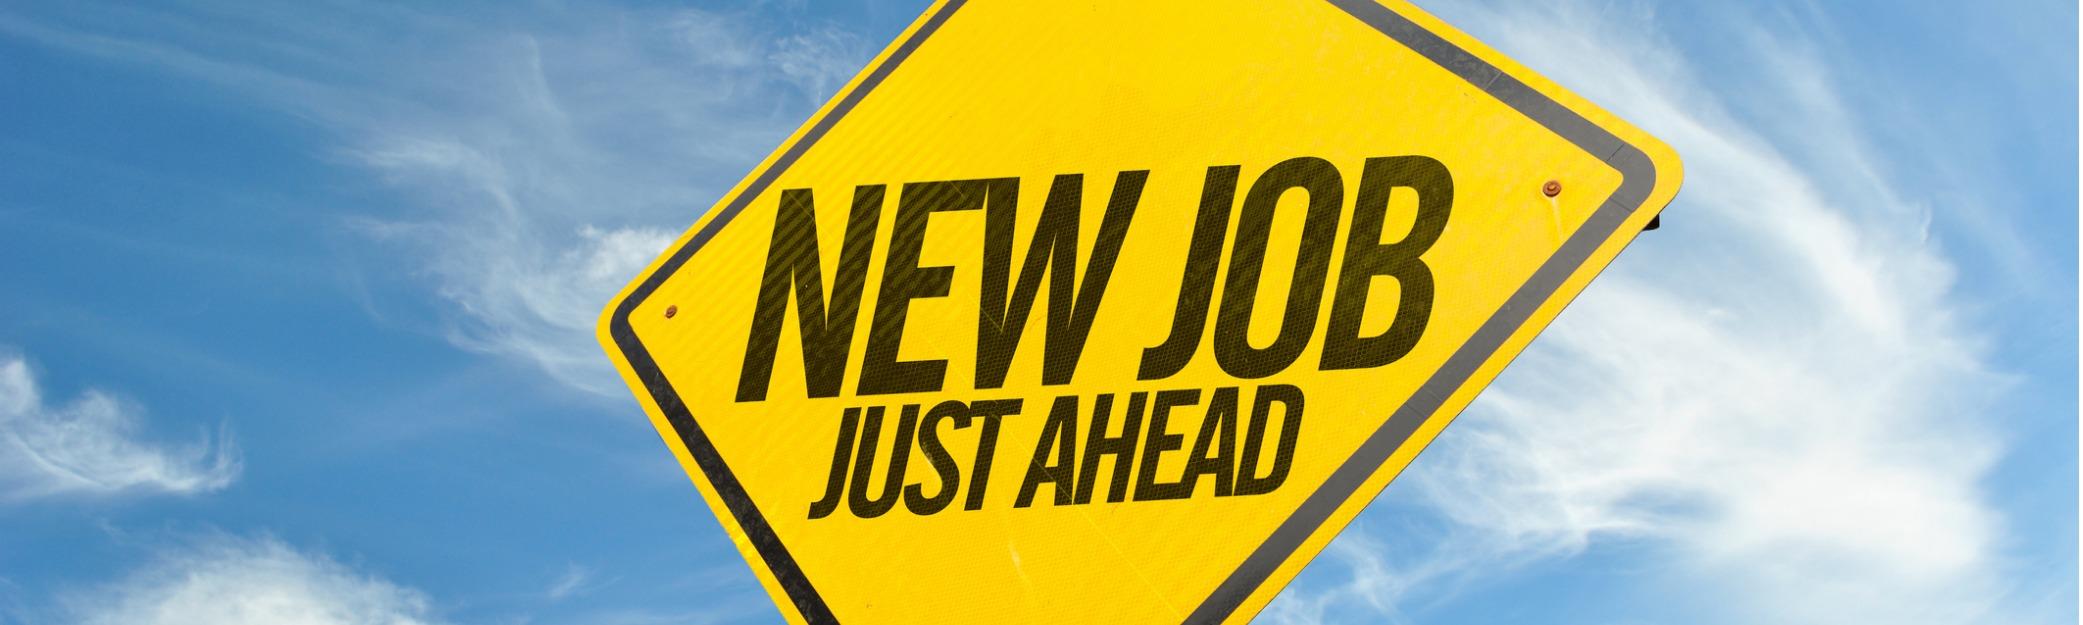 new job large.jpg